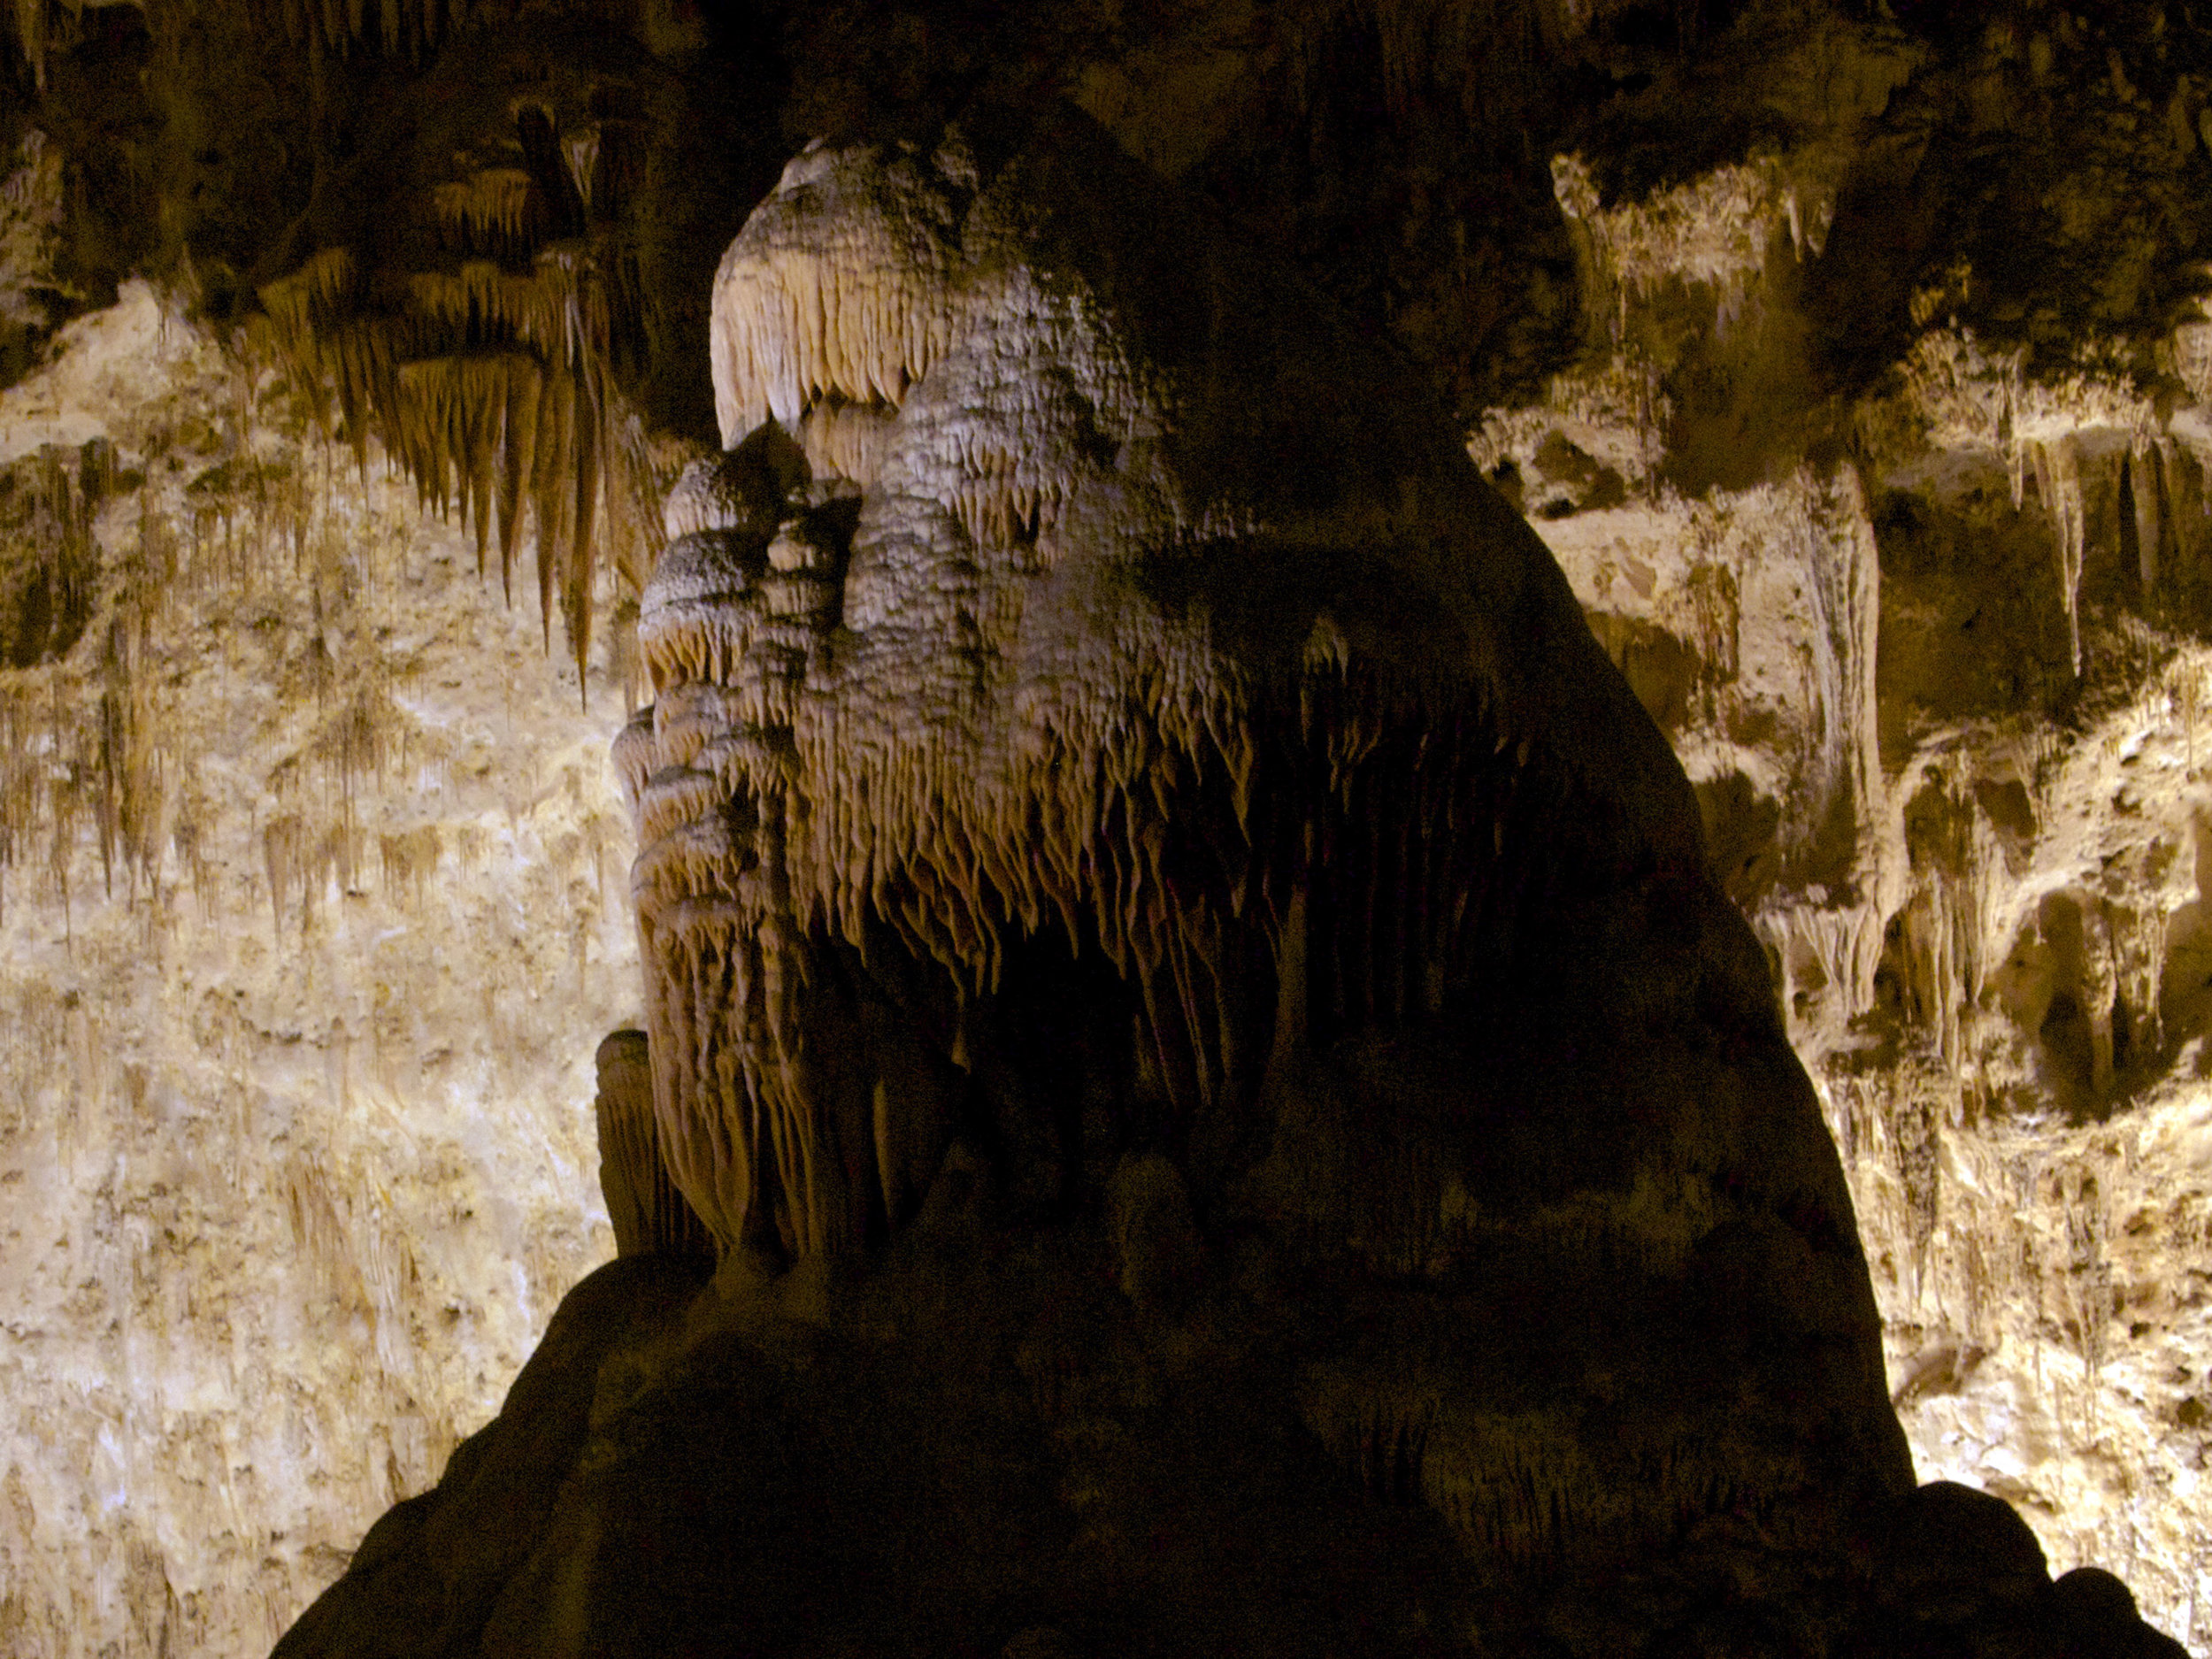 Cave Sasquatch? - Photo by Tim Giller